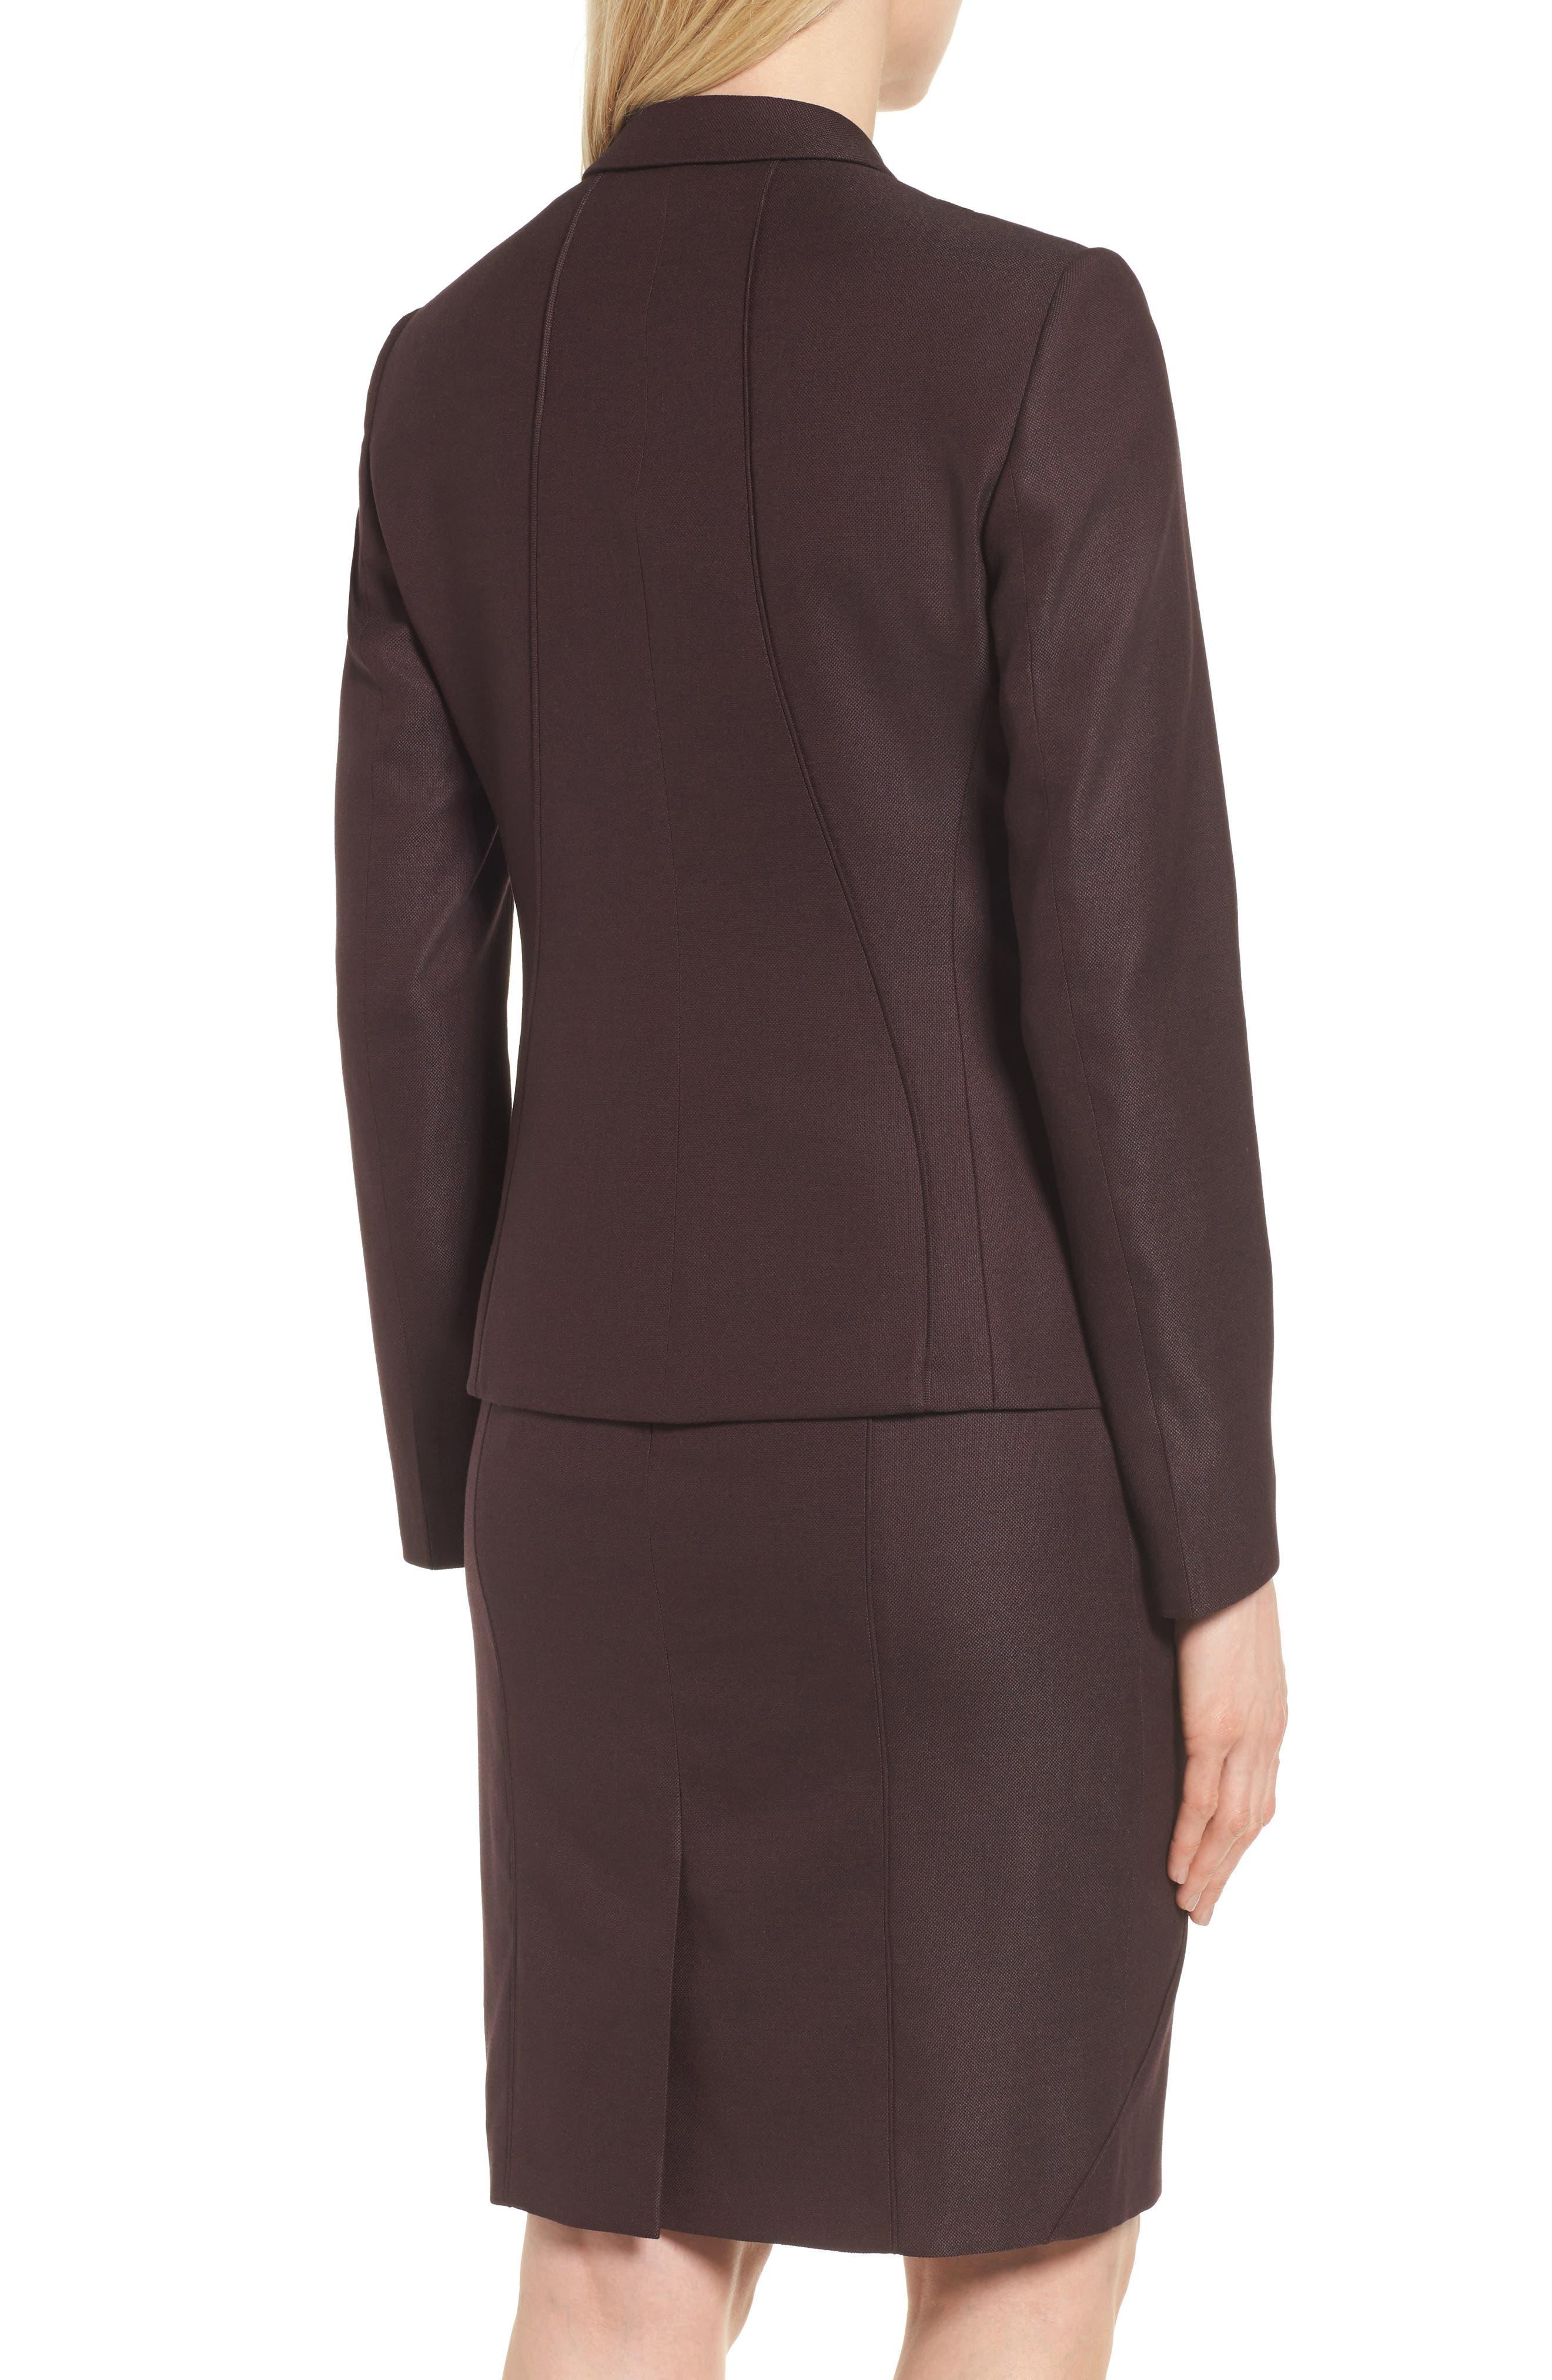 Jenesa Suit Jacket,                             Alternate thumbnail 2, color,